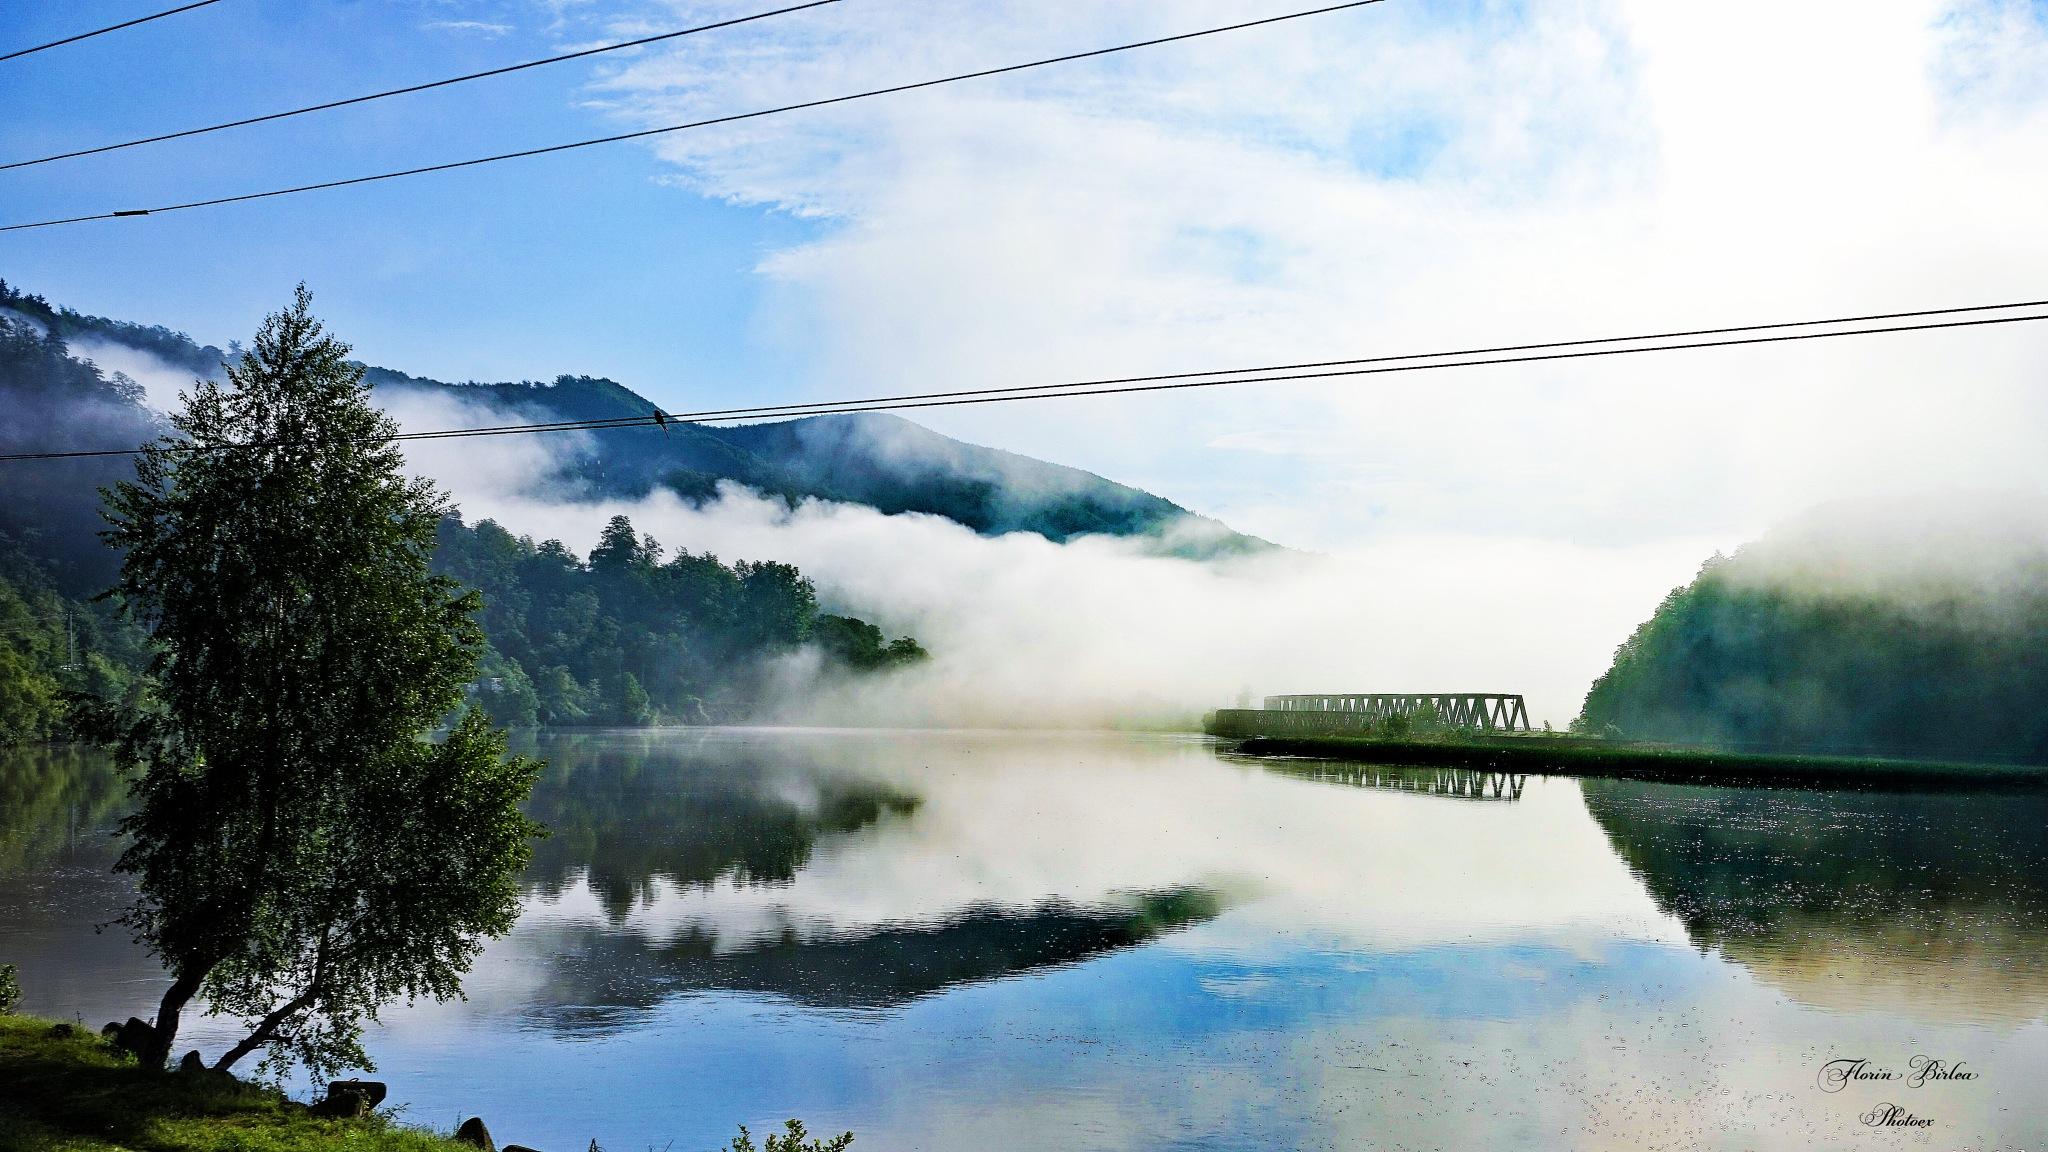 Morning mist by Florian B